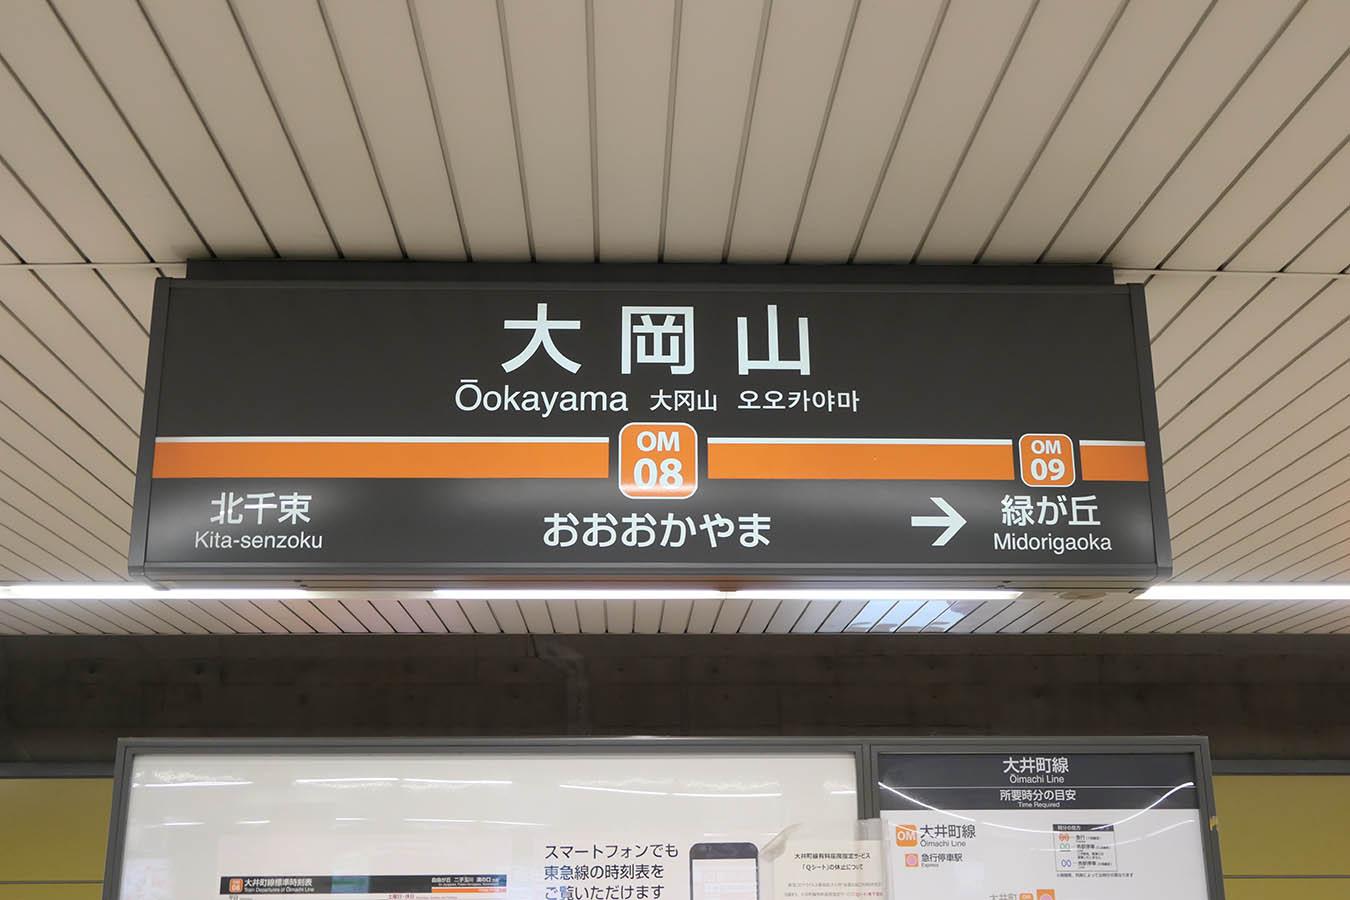 MG06_photo06.jpg